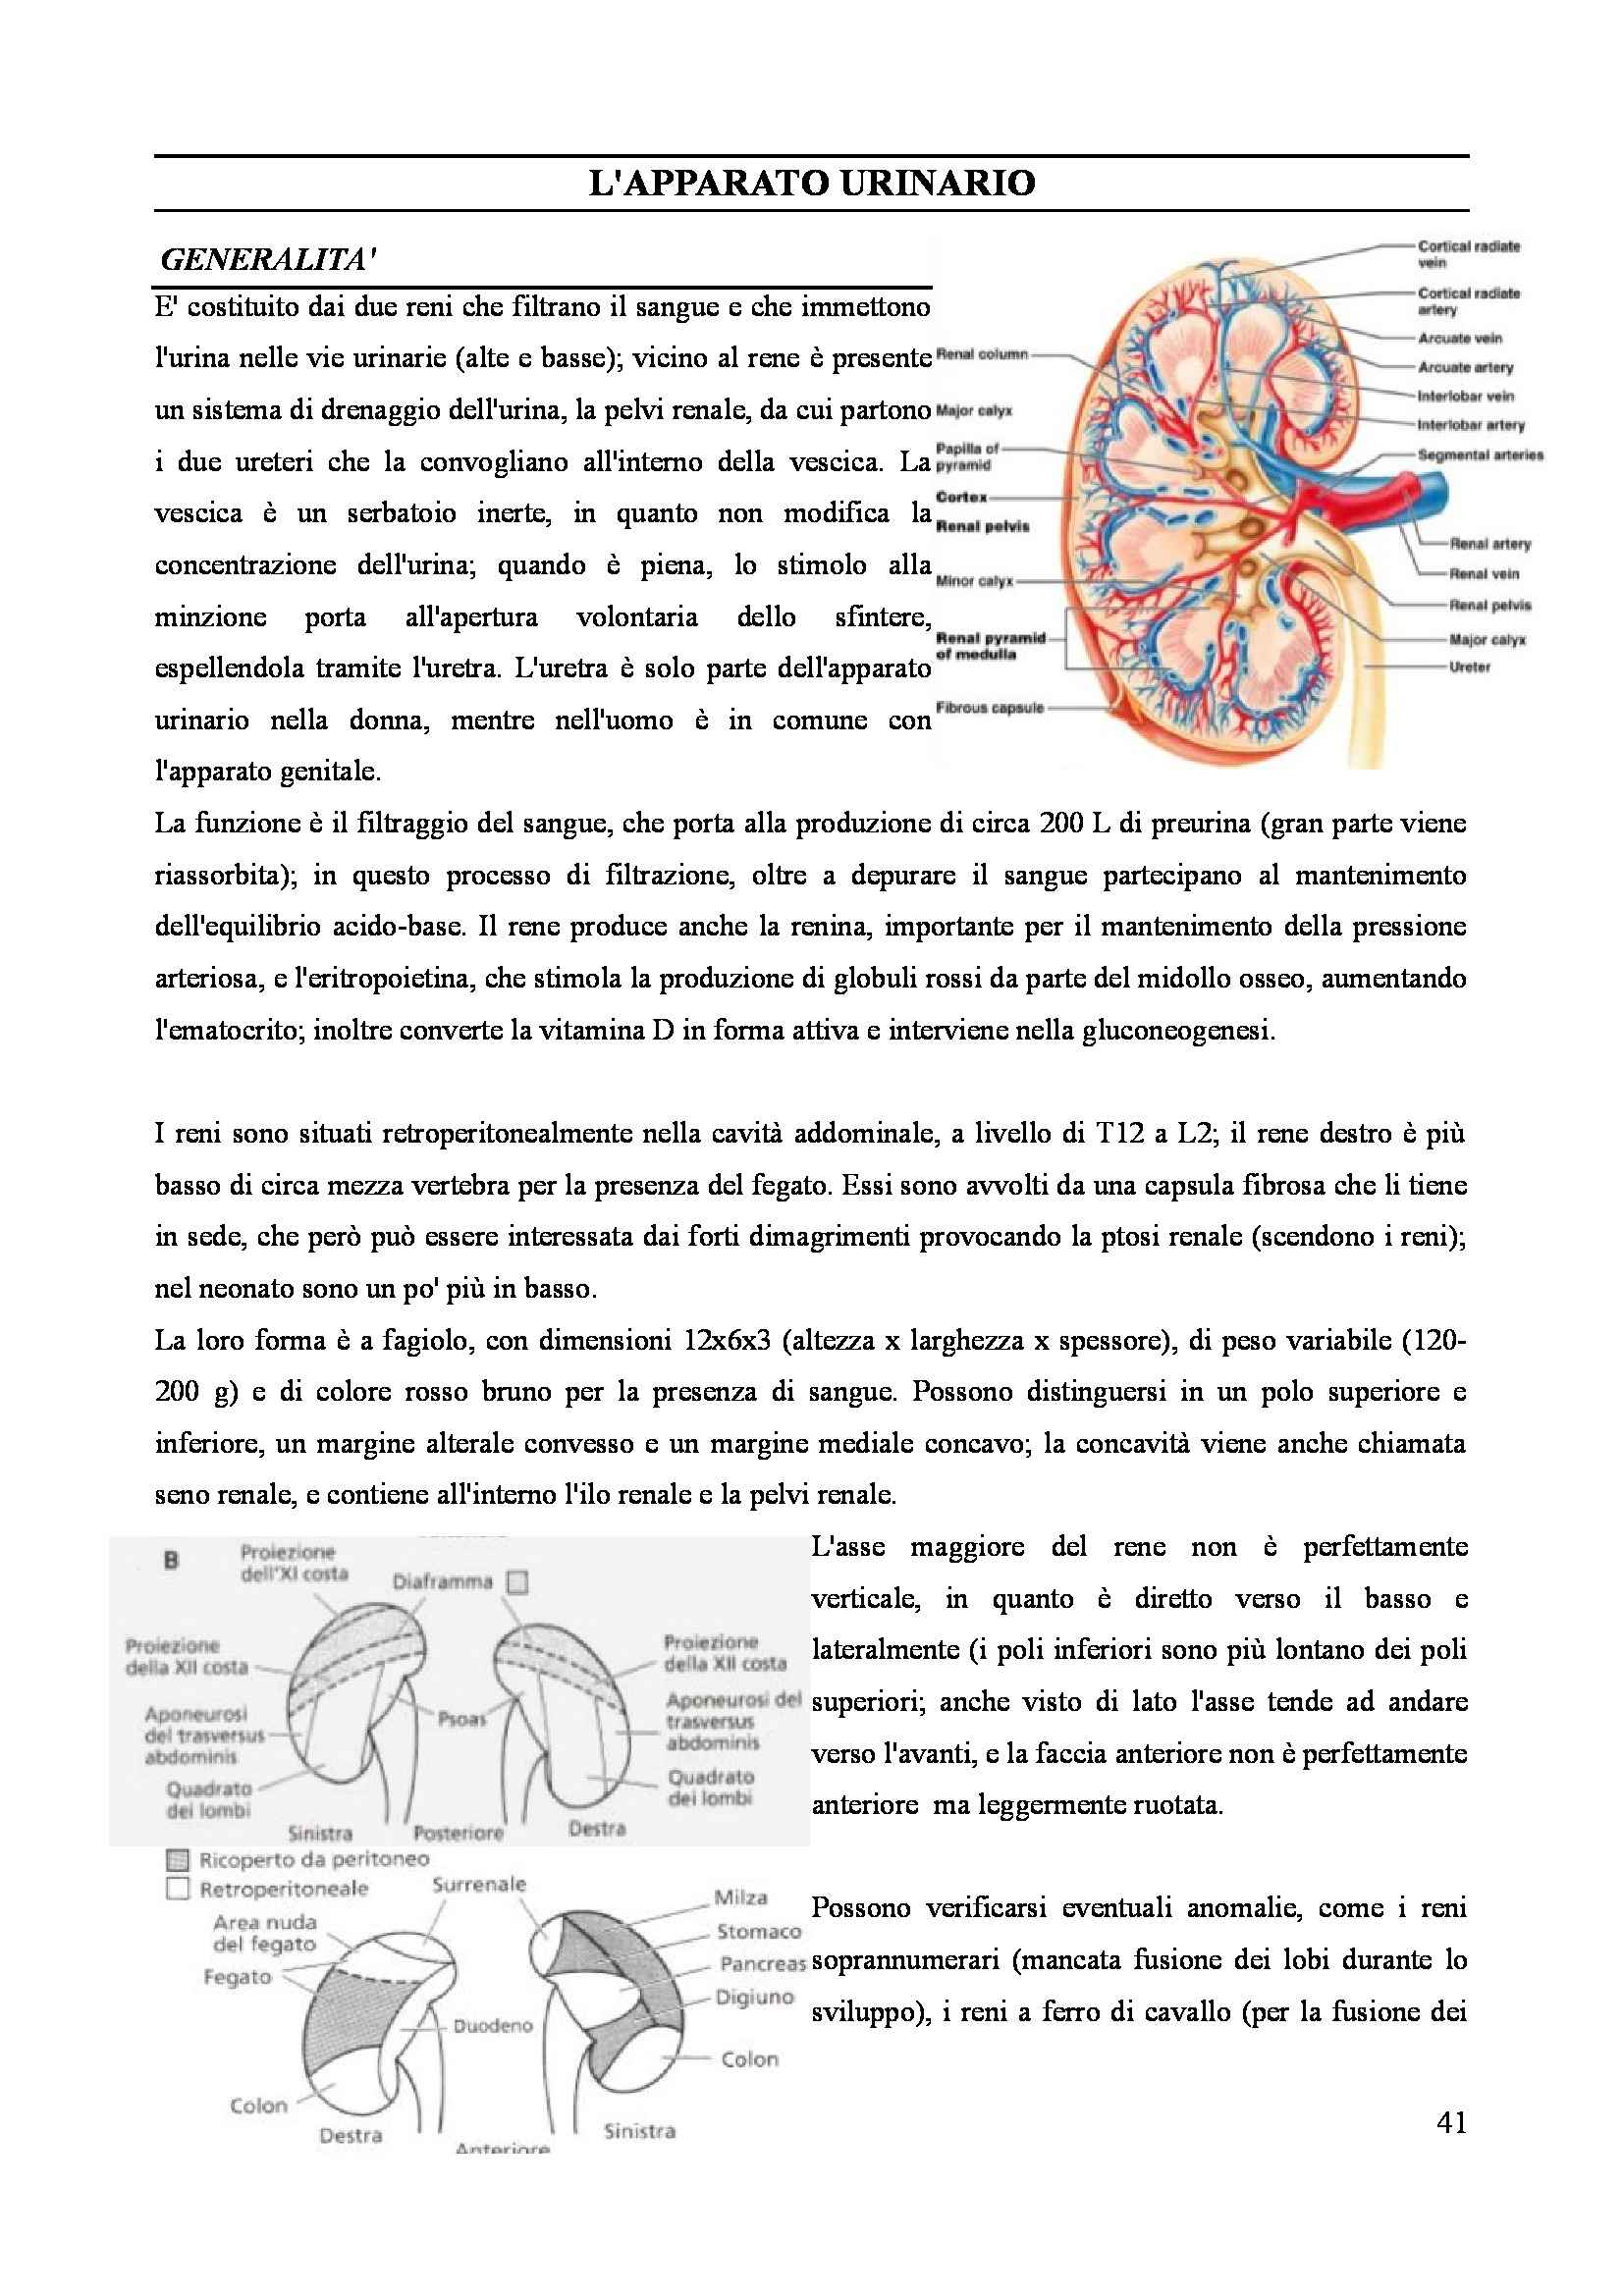 Anatomia II - Splancnologia Pag. 41